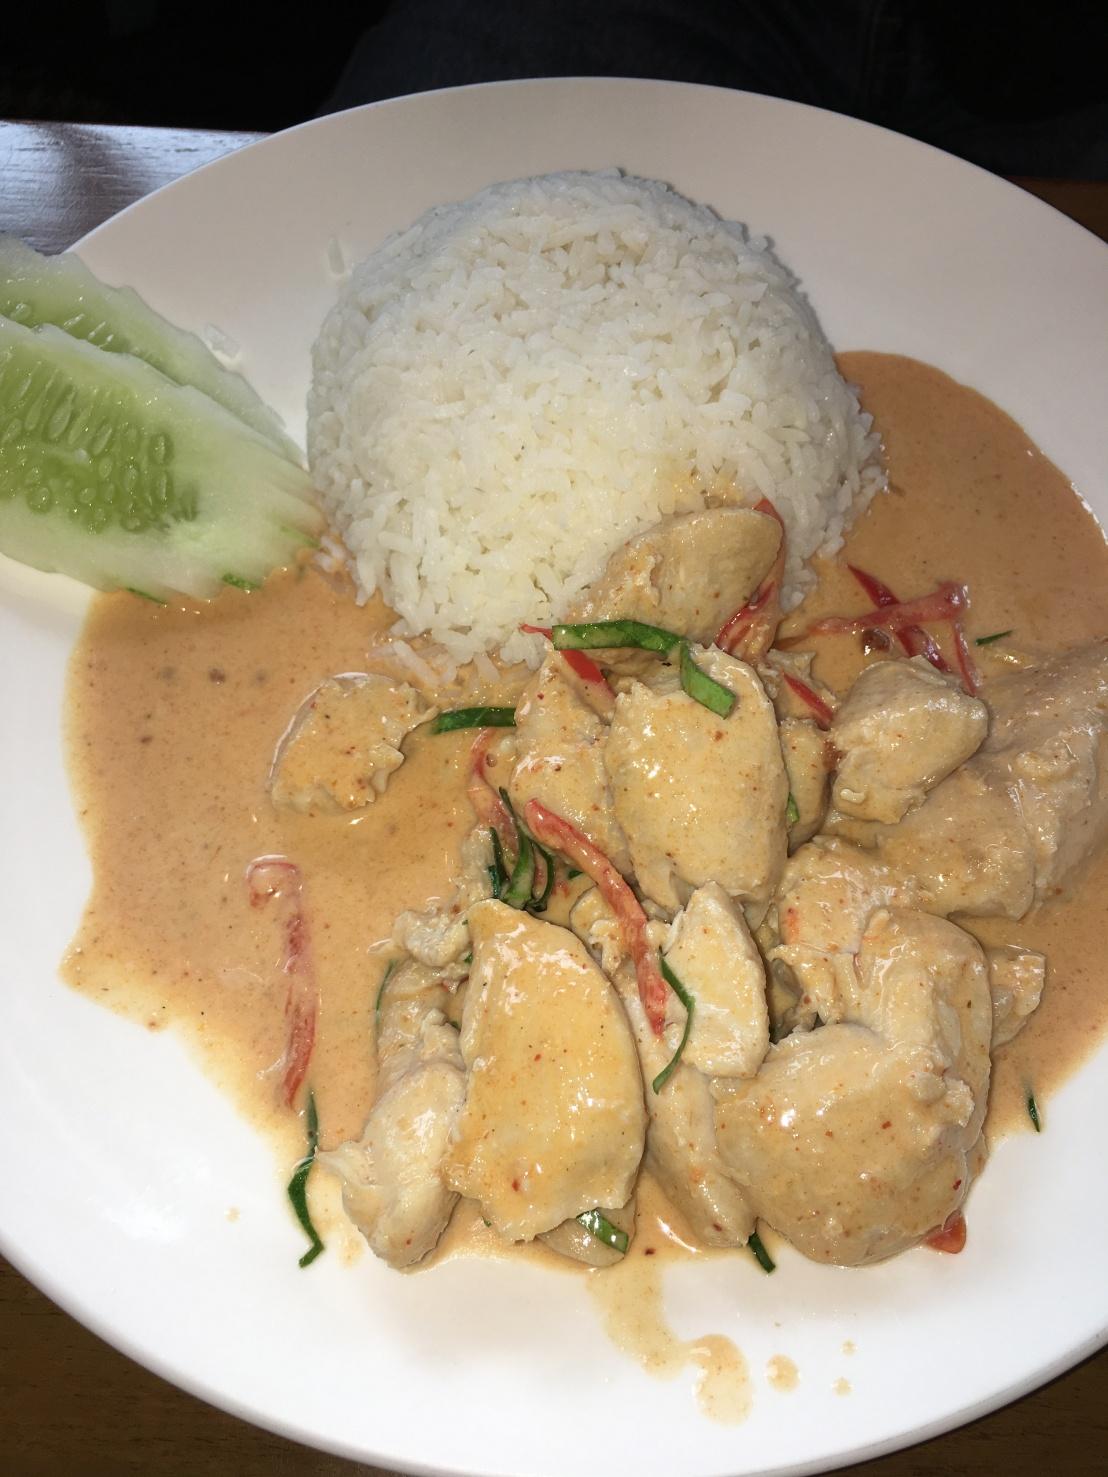 Day 1 - Bangkok - Lunch @ Baan ThaThien Cafe 4